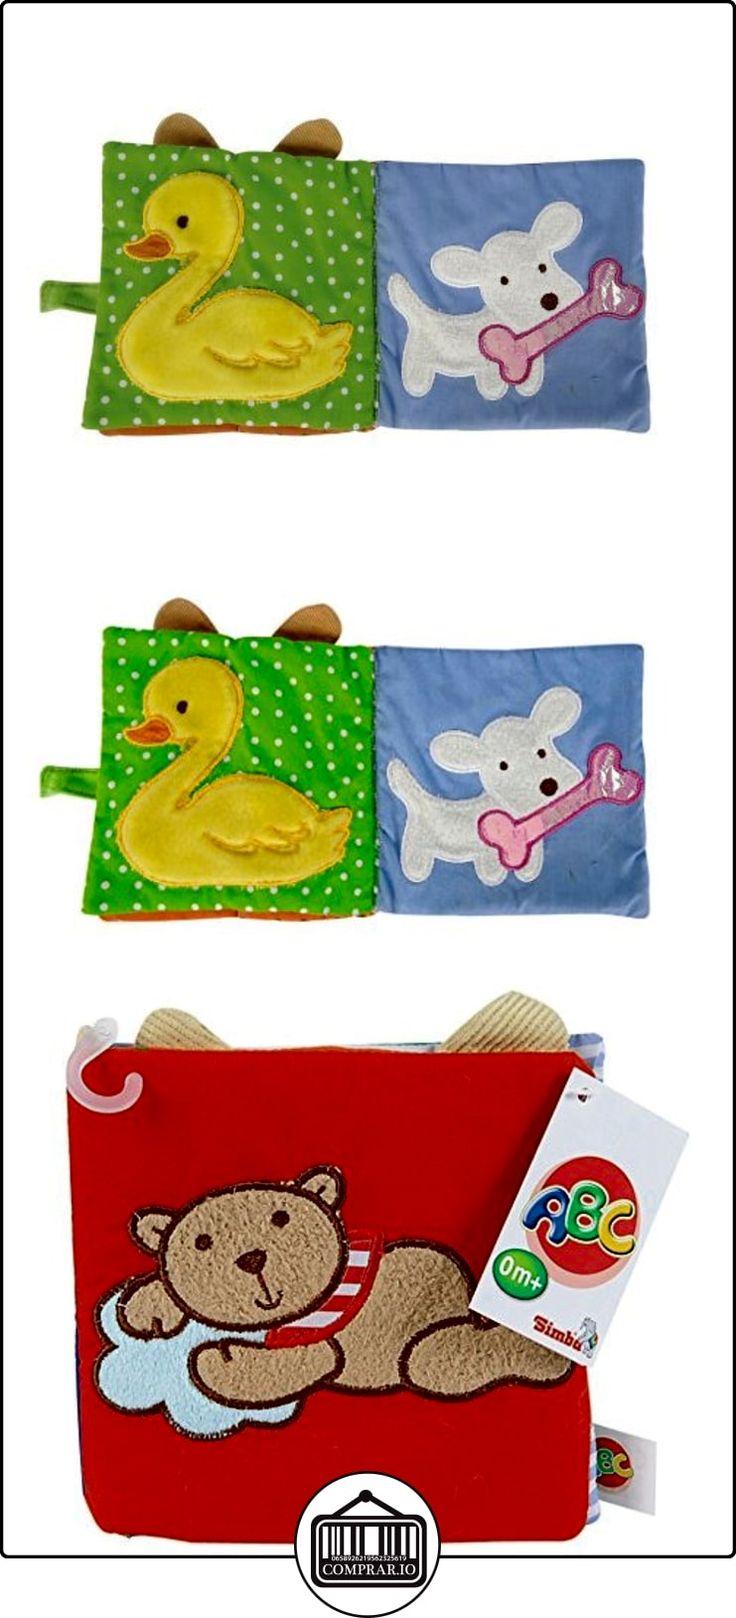 Abc - Libro suave (Simba Dickie 4019621)  ✿ Regalos para recién nacidos - Bebes ✿ ▬► Ver oferta: http://comprar.io/goto/B006IS9S5Q